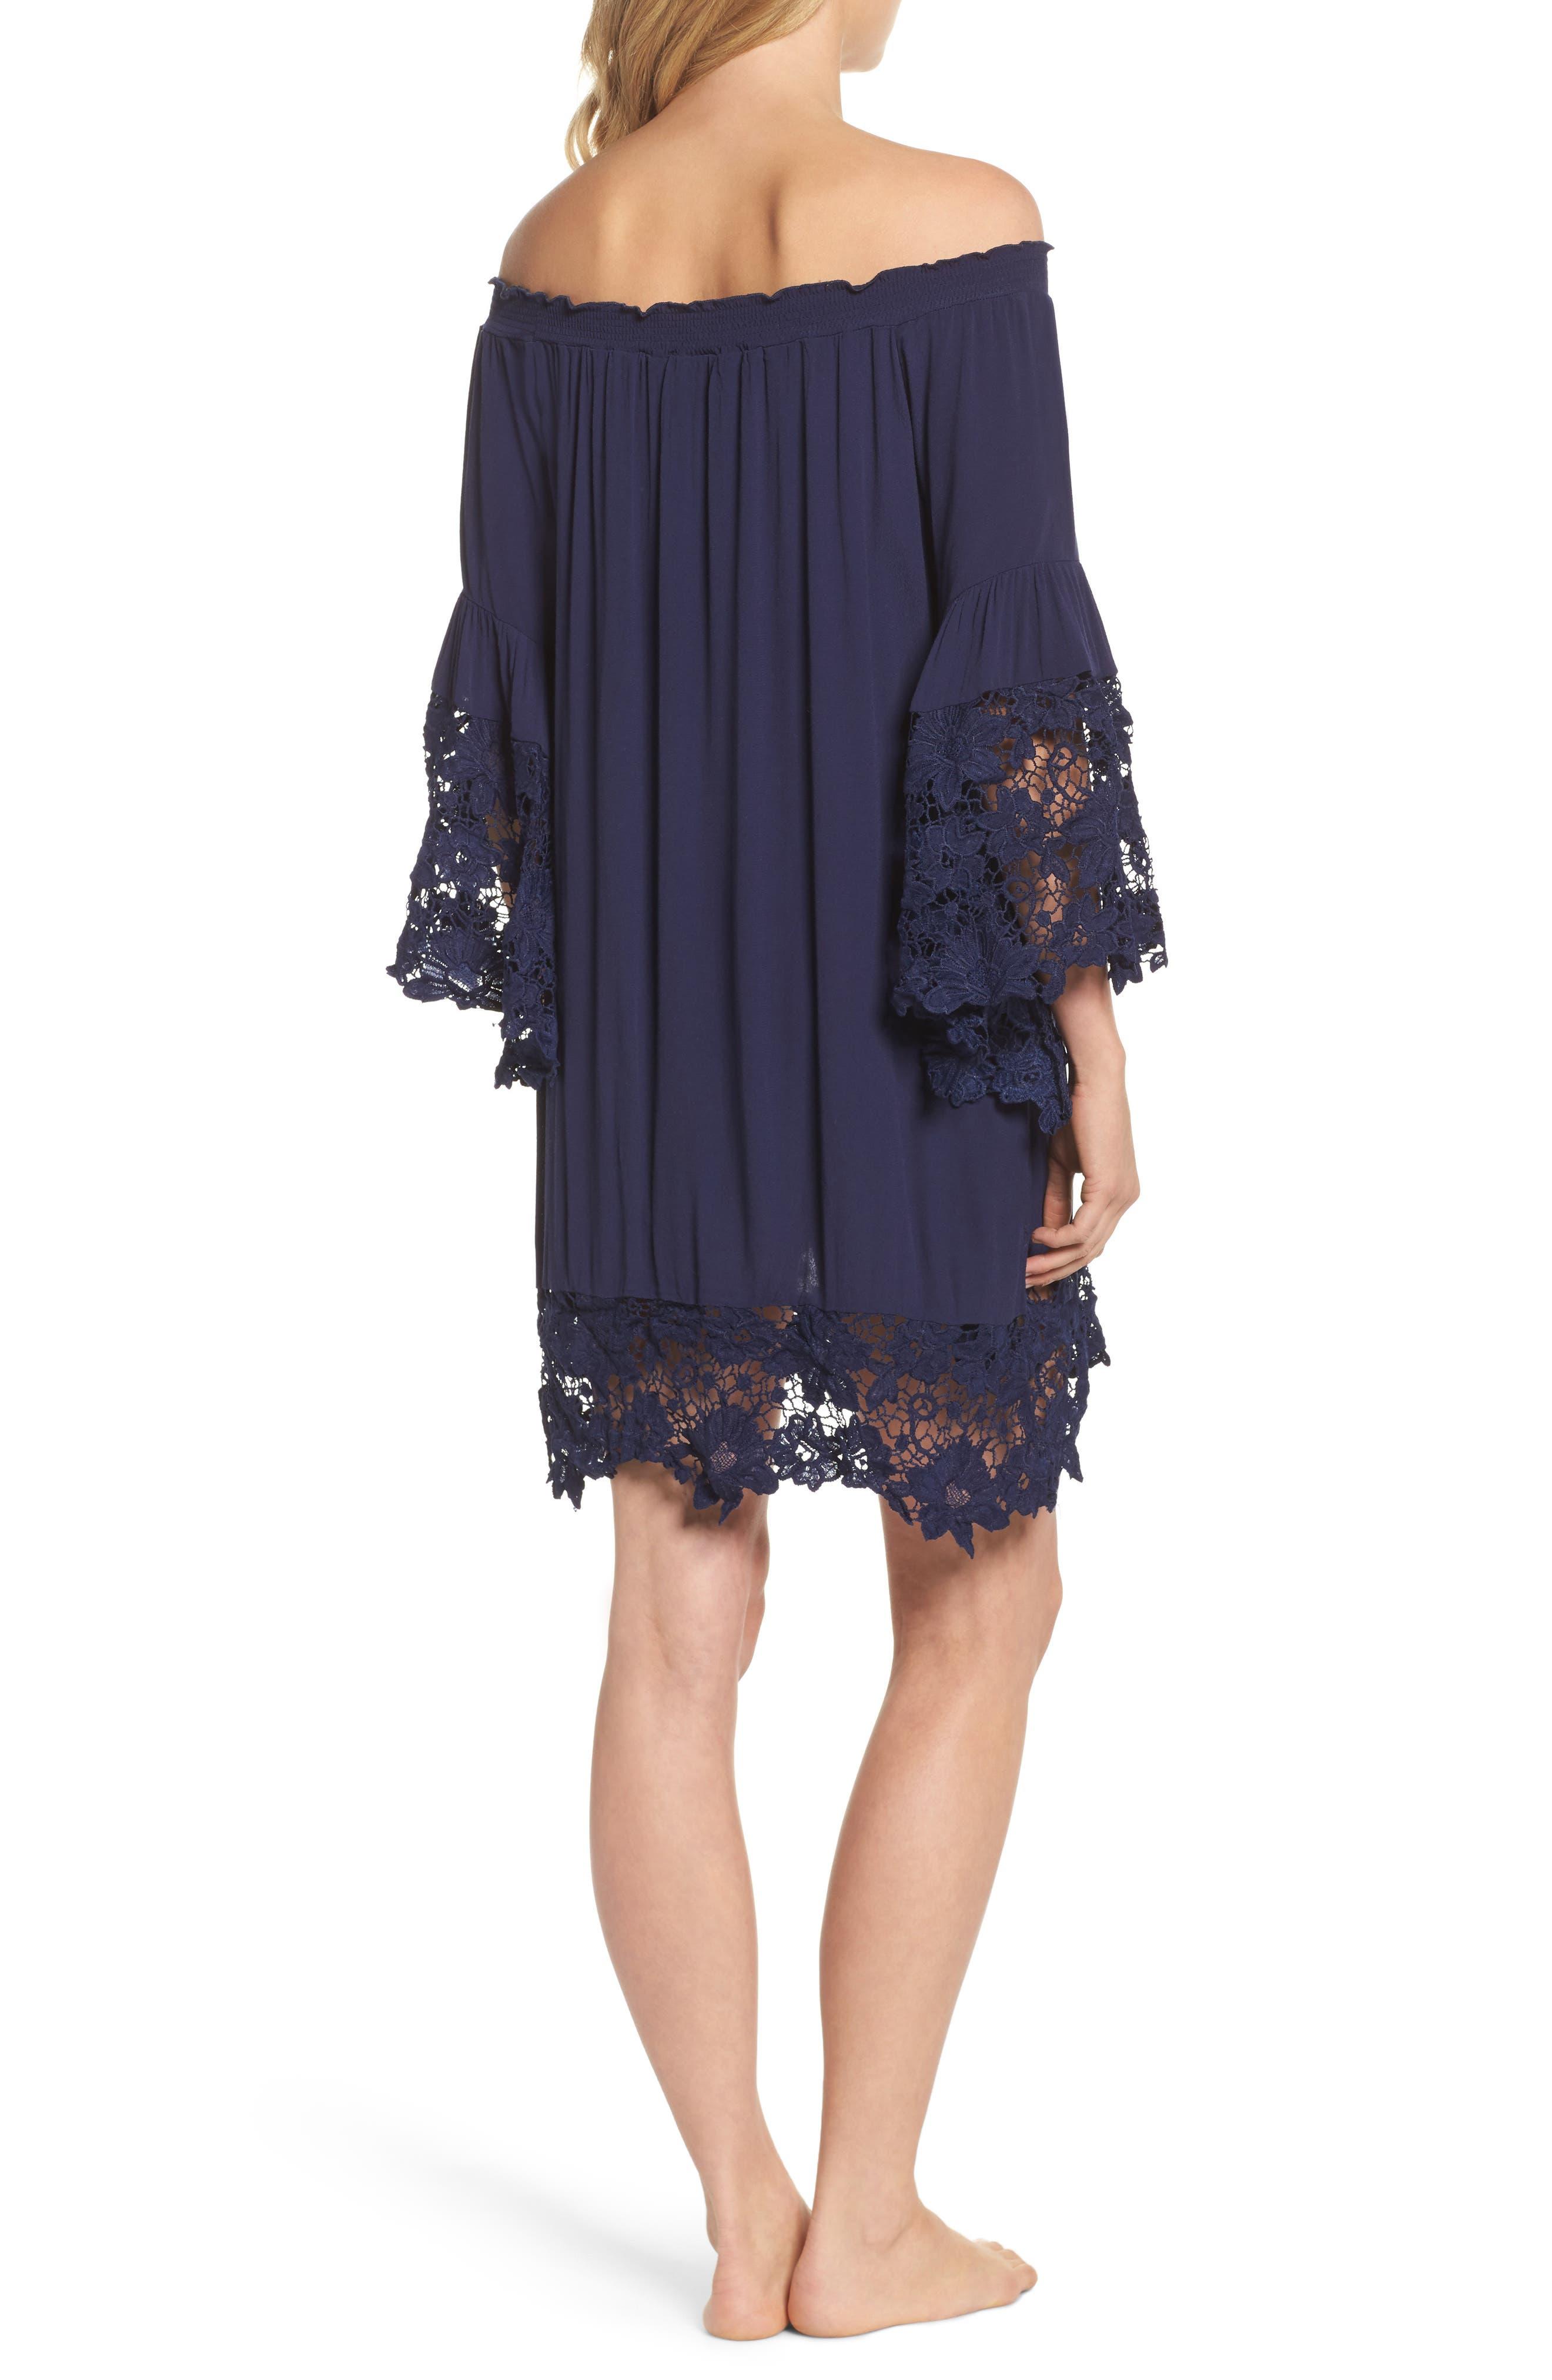 Alternate Image 2  - Muche et Muchette Jolie Lace Accent Cover-Up Dress